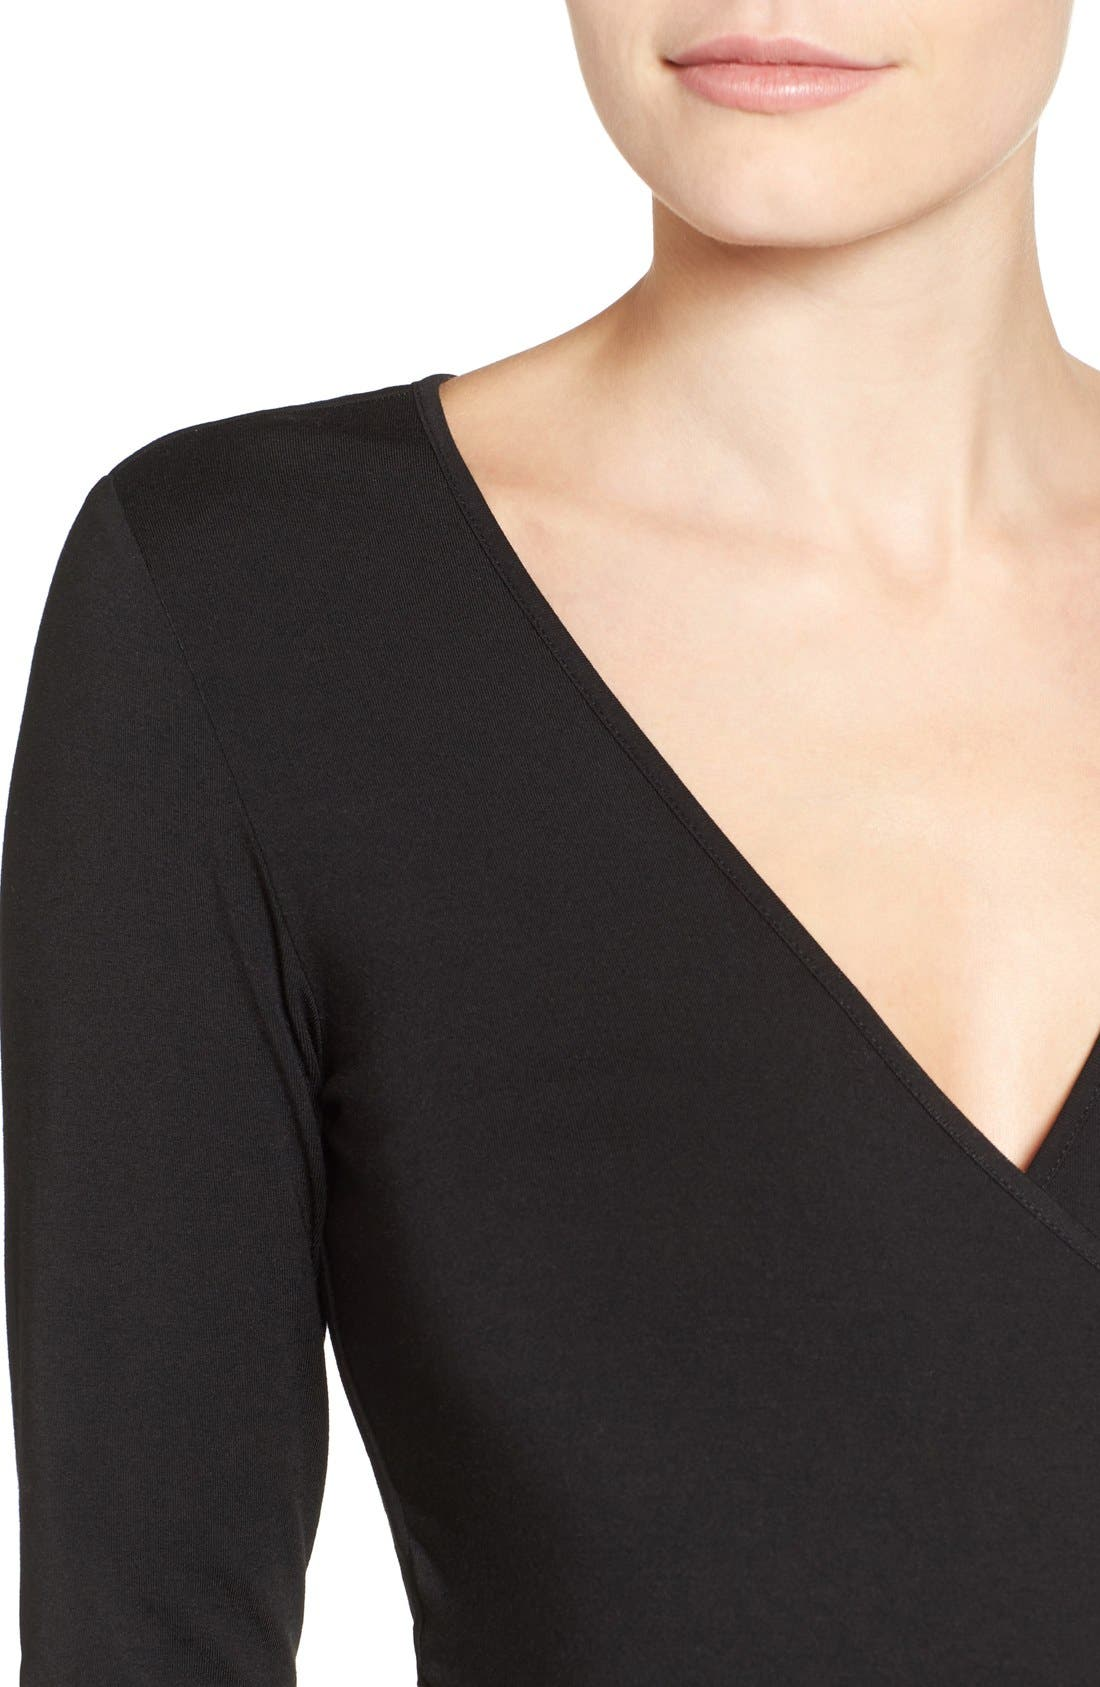 TART MATERNITY, Tart 'Peaches' Maternity Body-Con Dress, Alternate thumbnail 4, color, BLACK